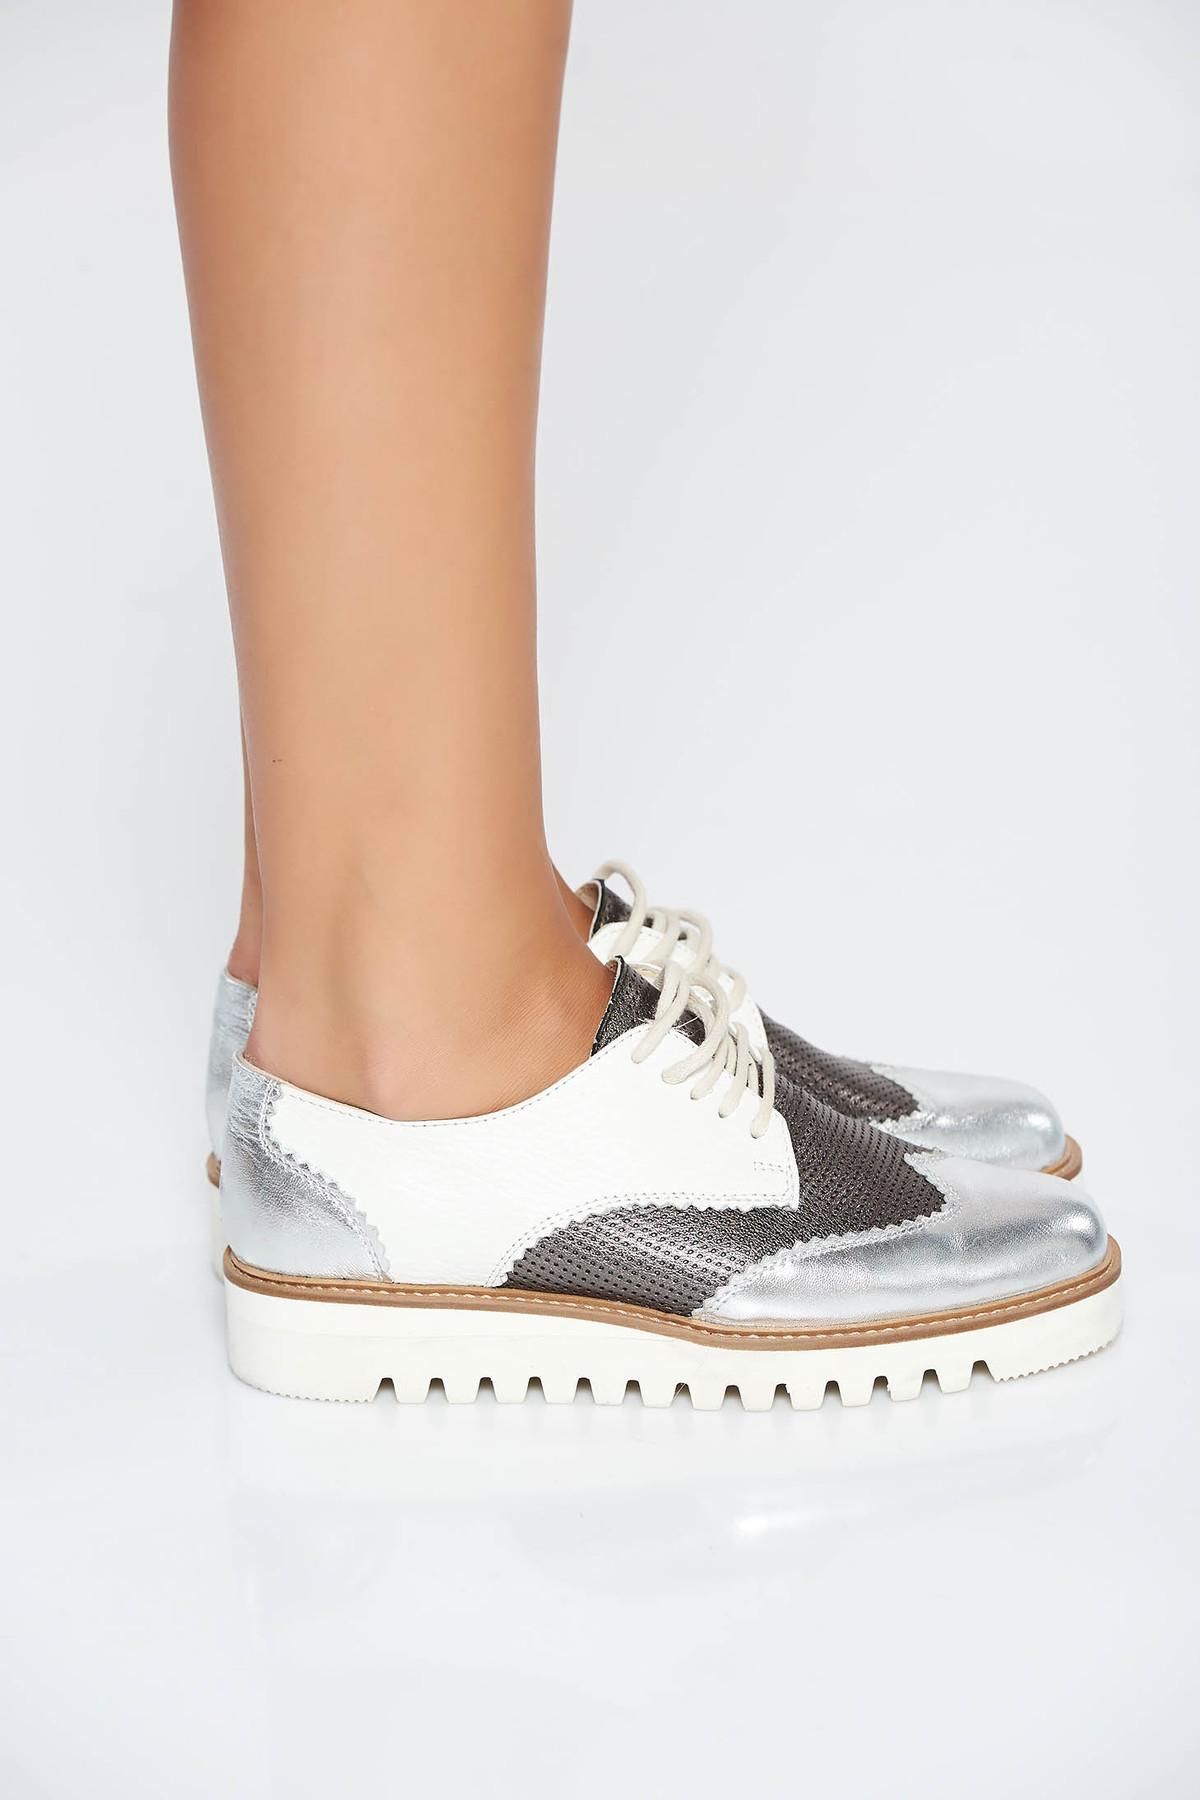 Pantofi argintiu casual din piele naturala cu siret